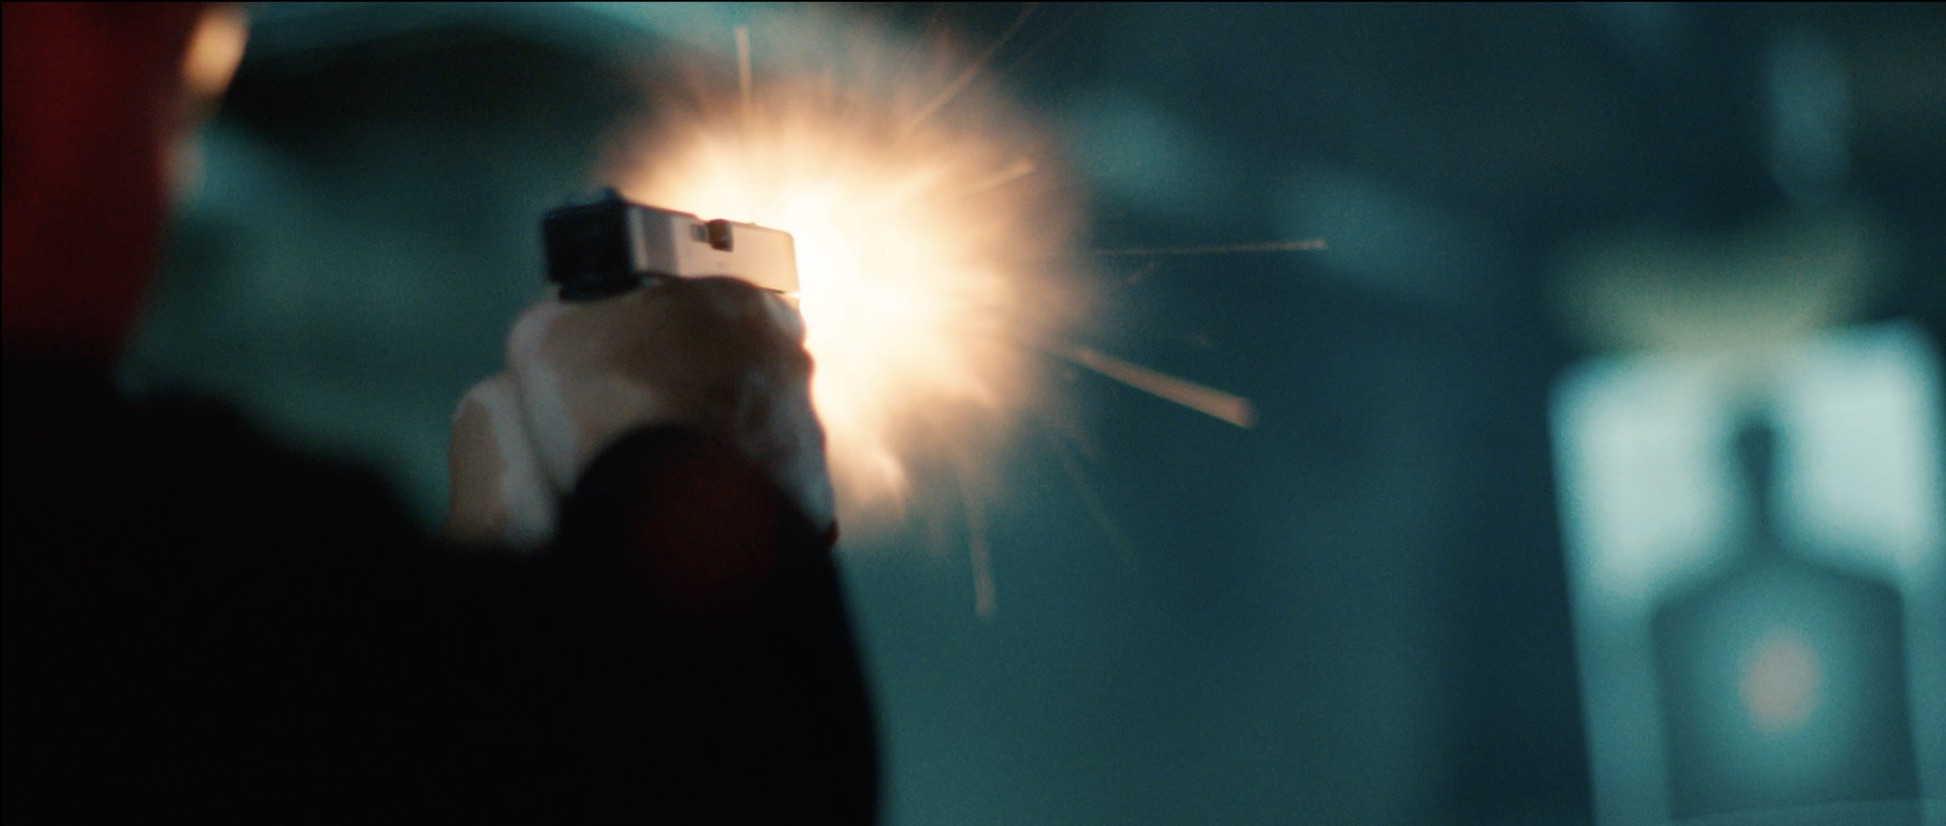 evil good gunshot.jpg